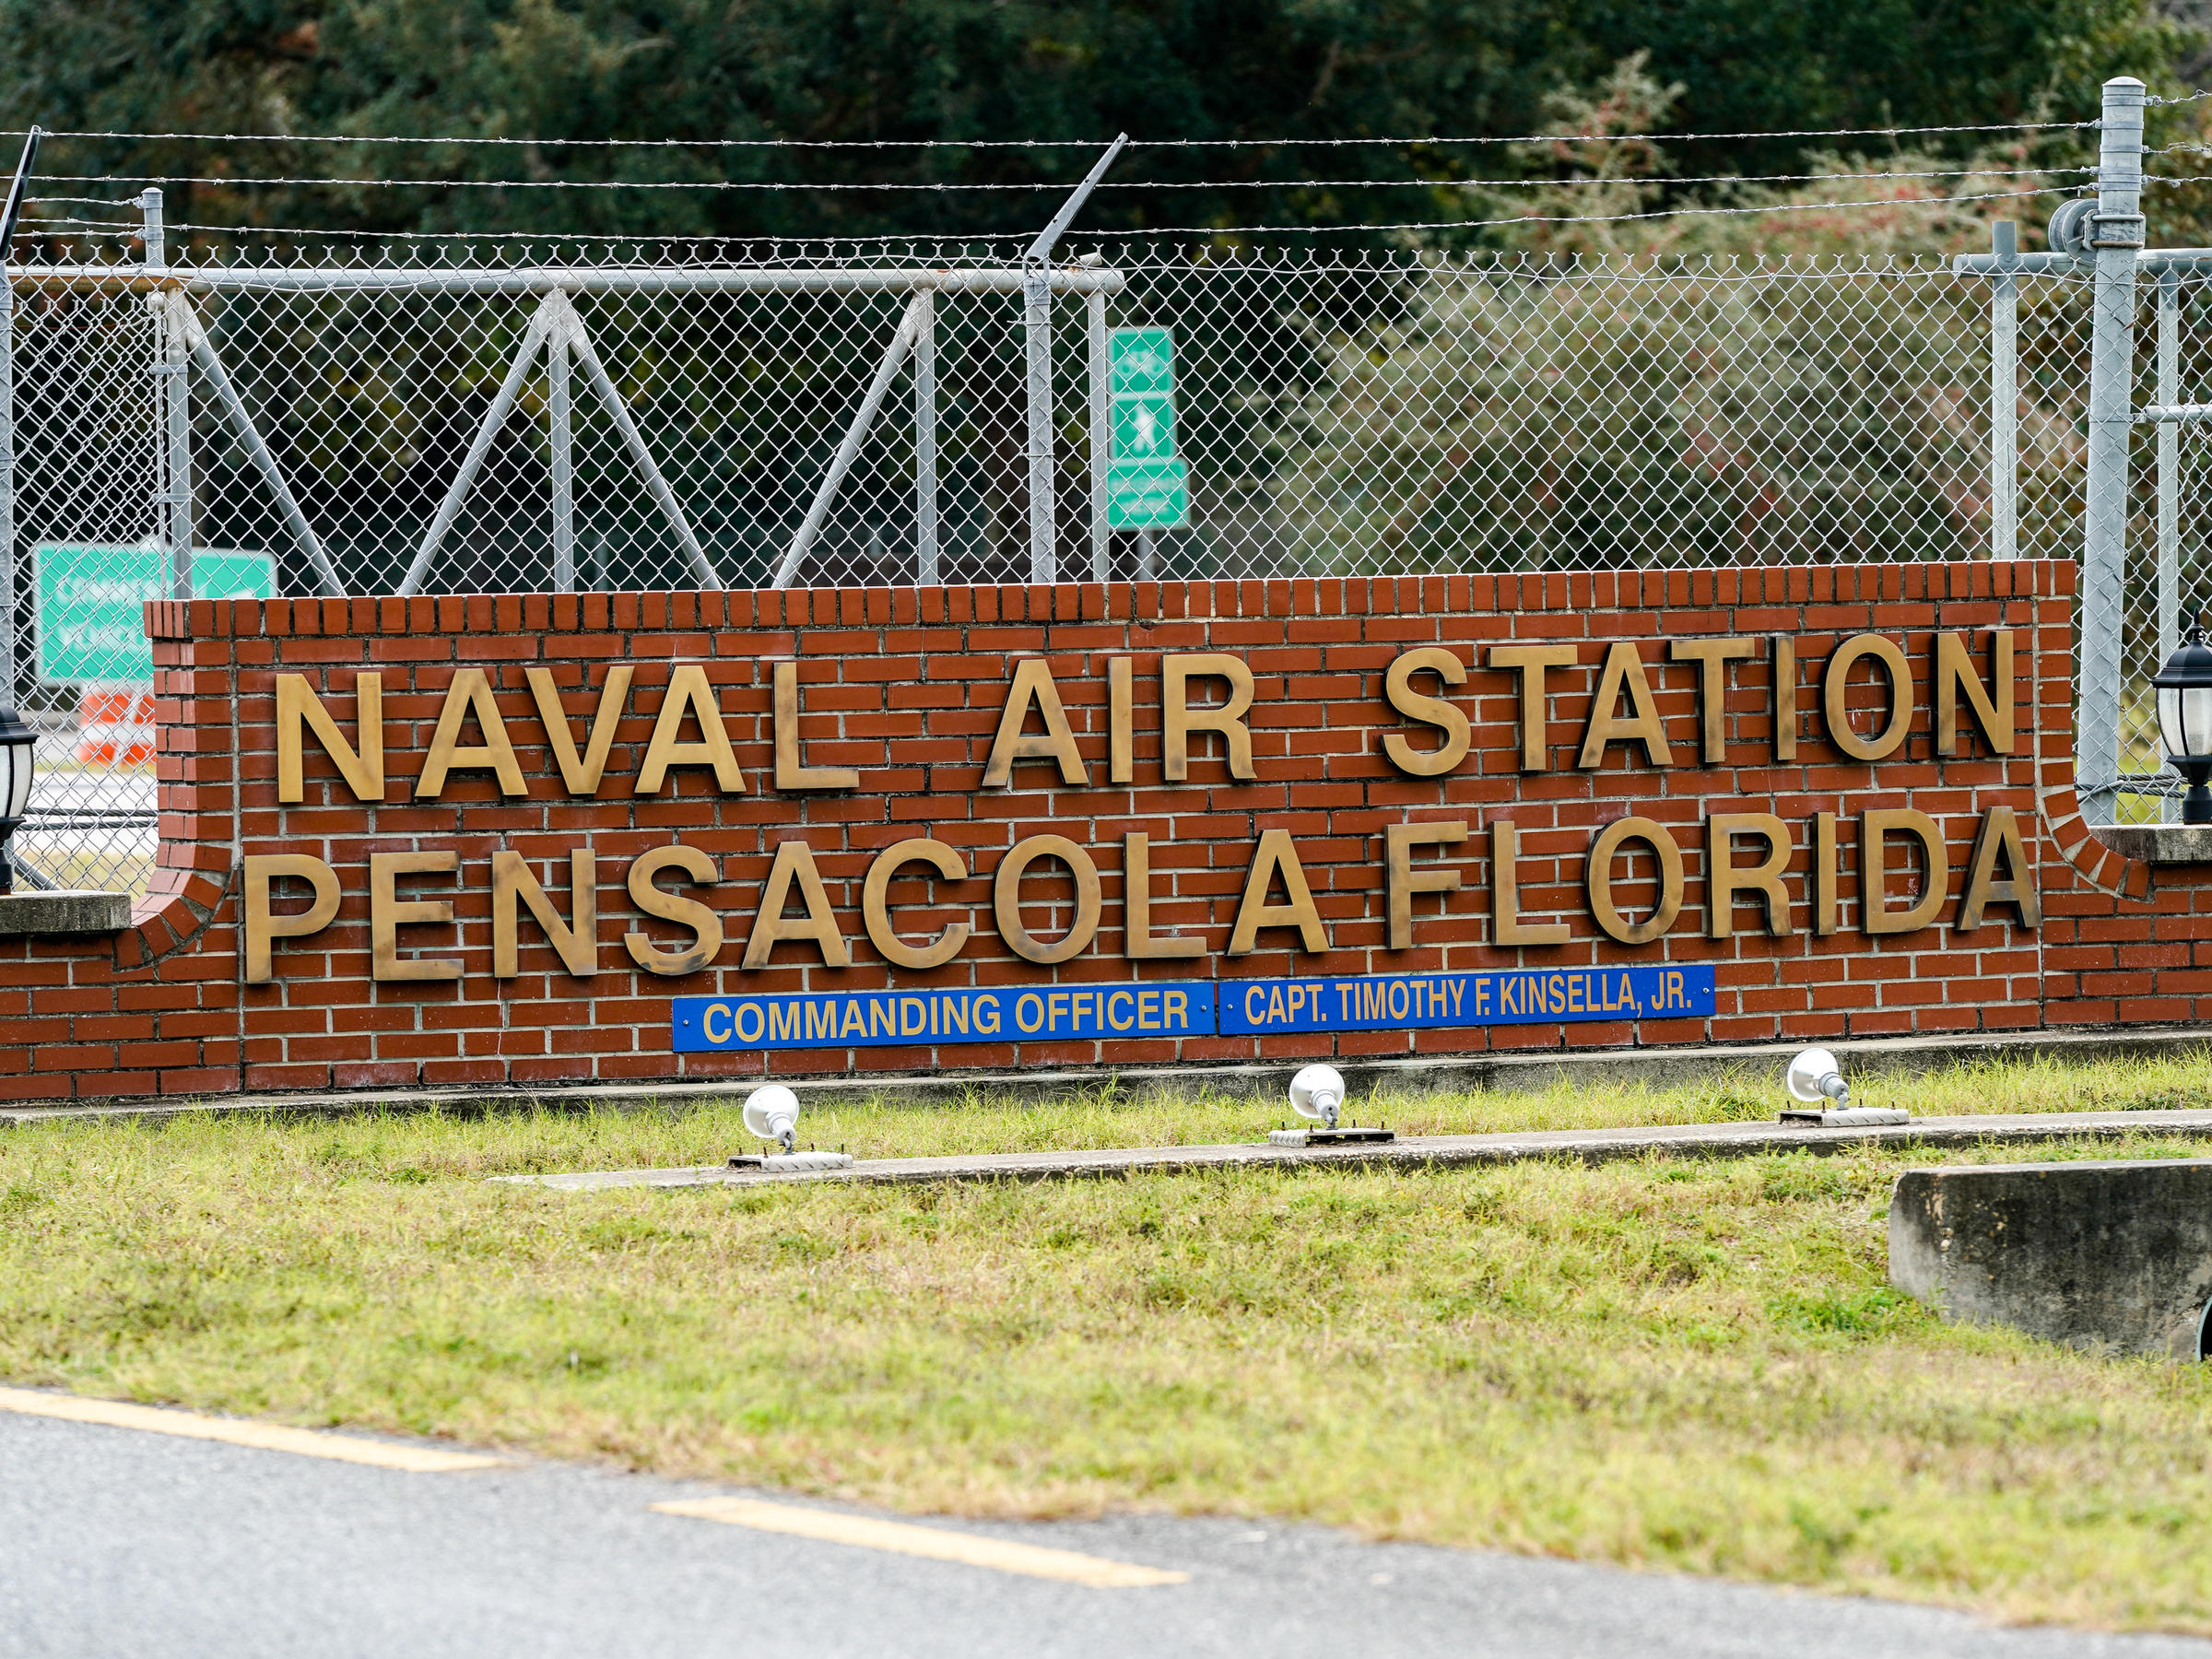 Family Of Pensacola Navy Base Shooting Says Victim 'Saved Countless Lives'